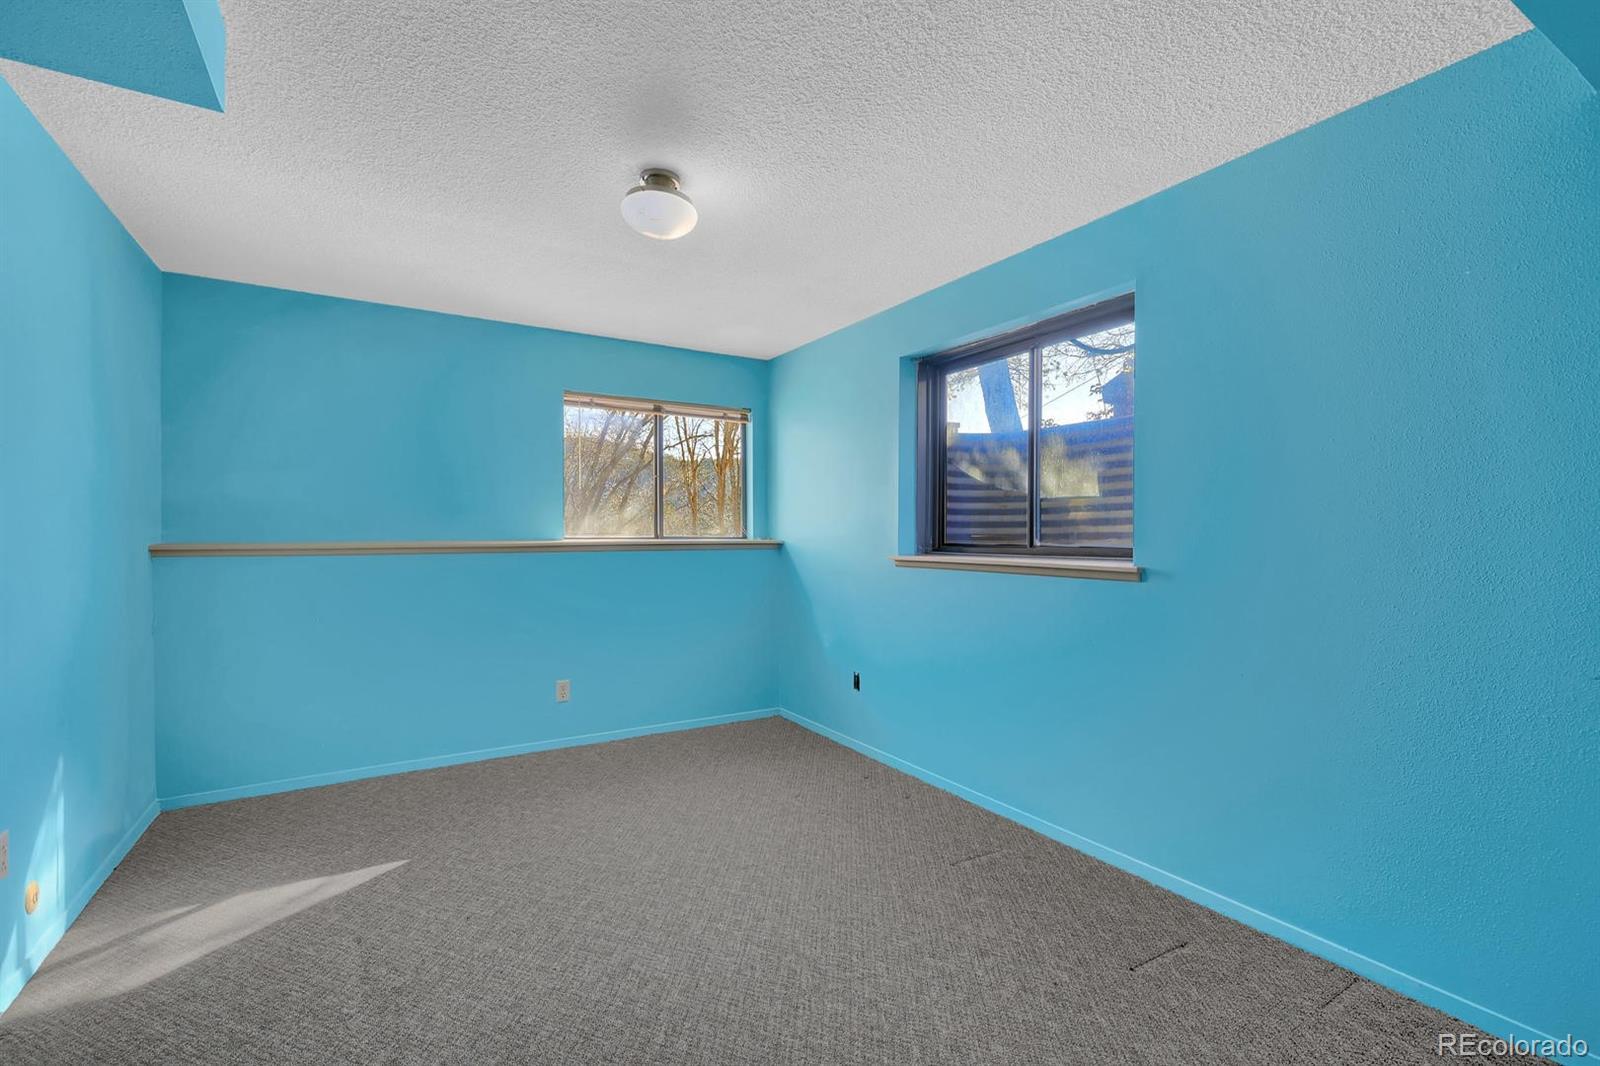 MLS# 2704020 - 28 - 11440 Valle Verde Drive, Colorado Springs, CO 80926